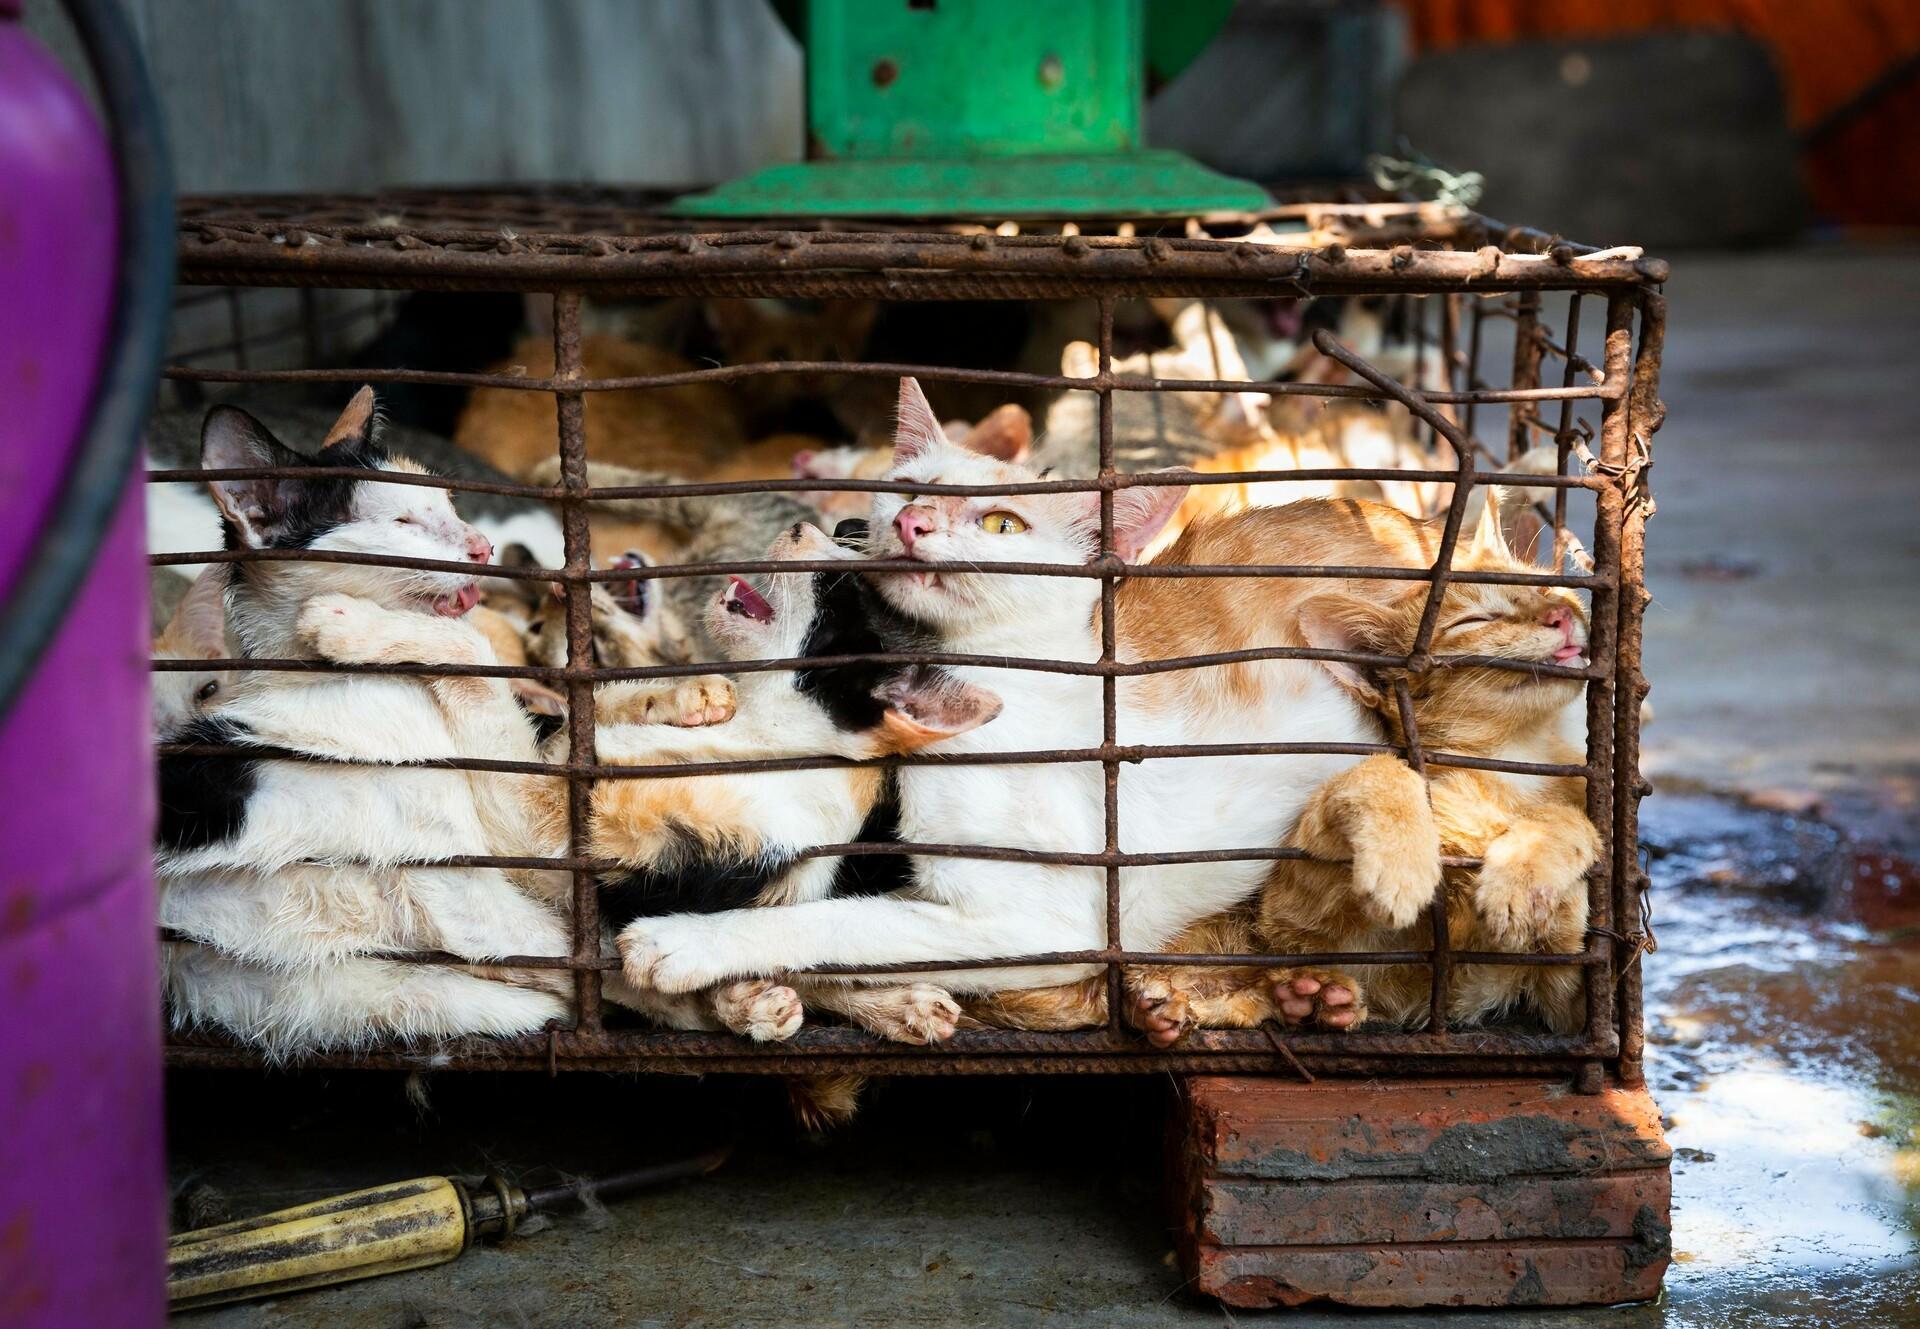 The cat meat trade in Vietnam